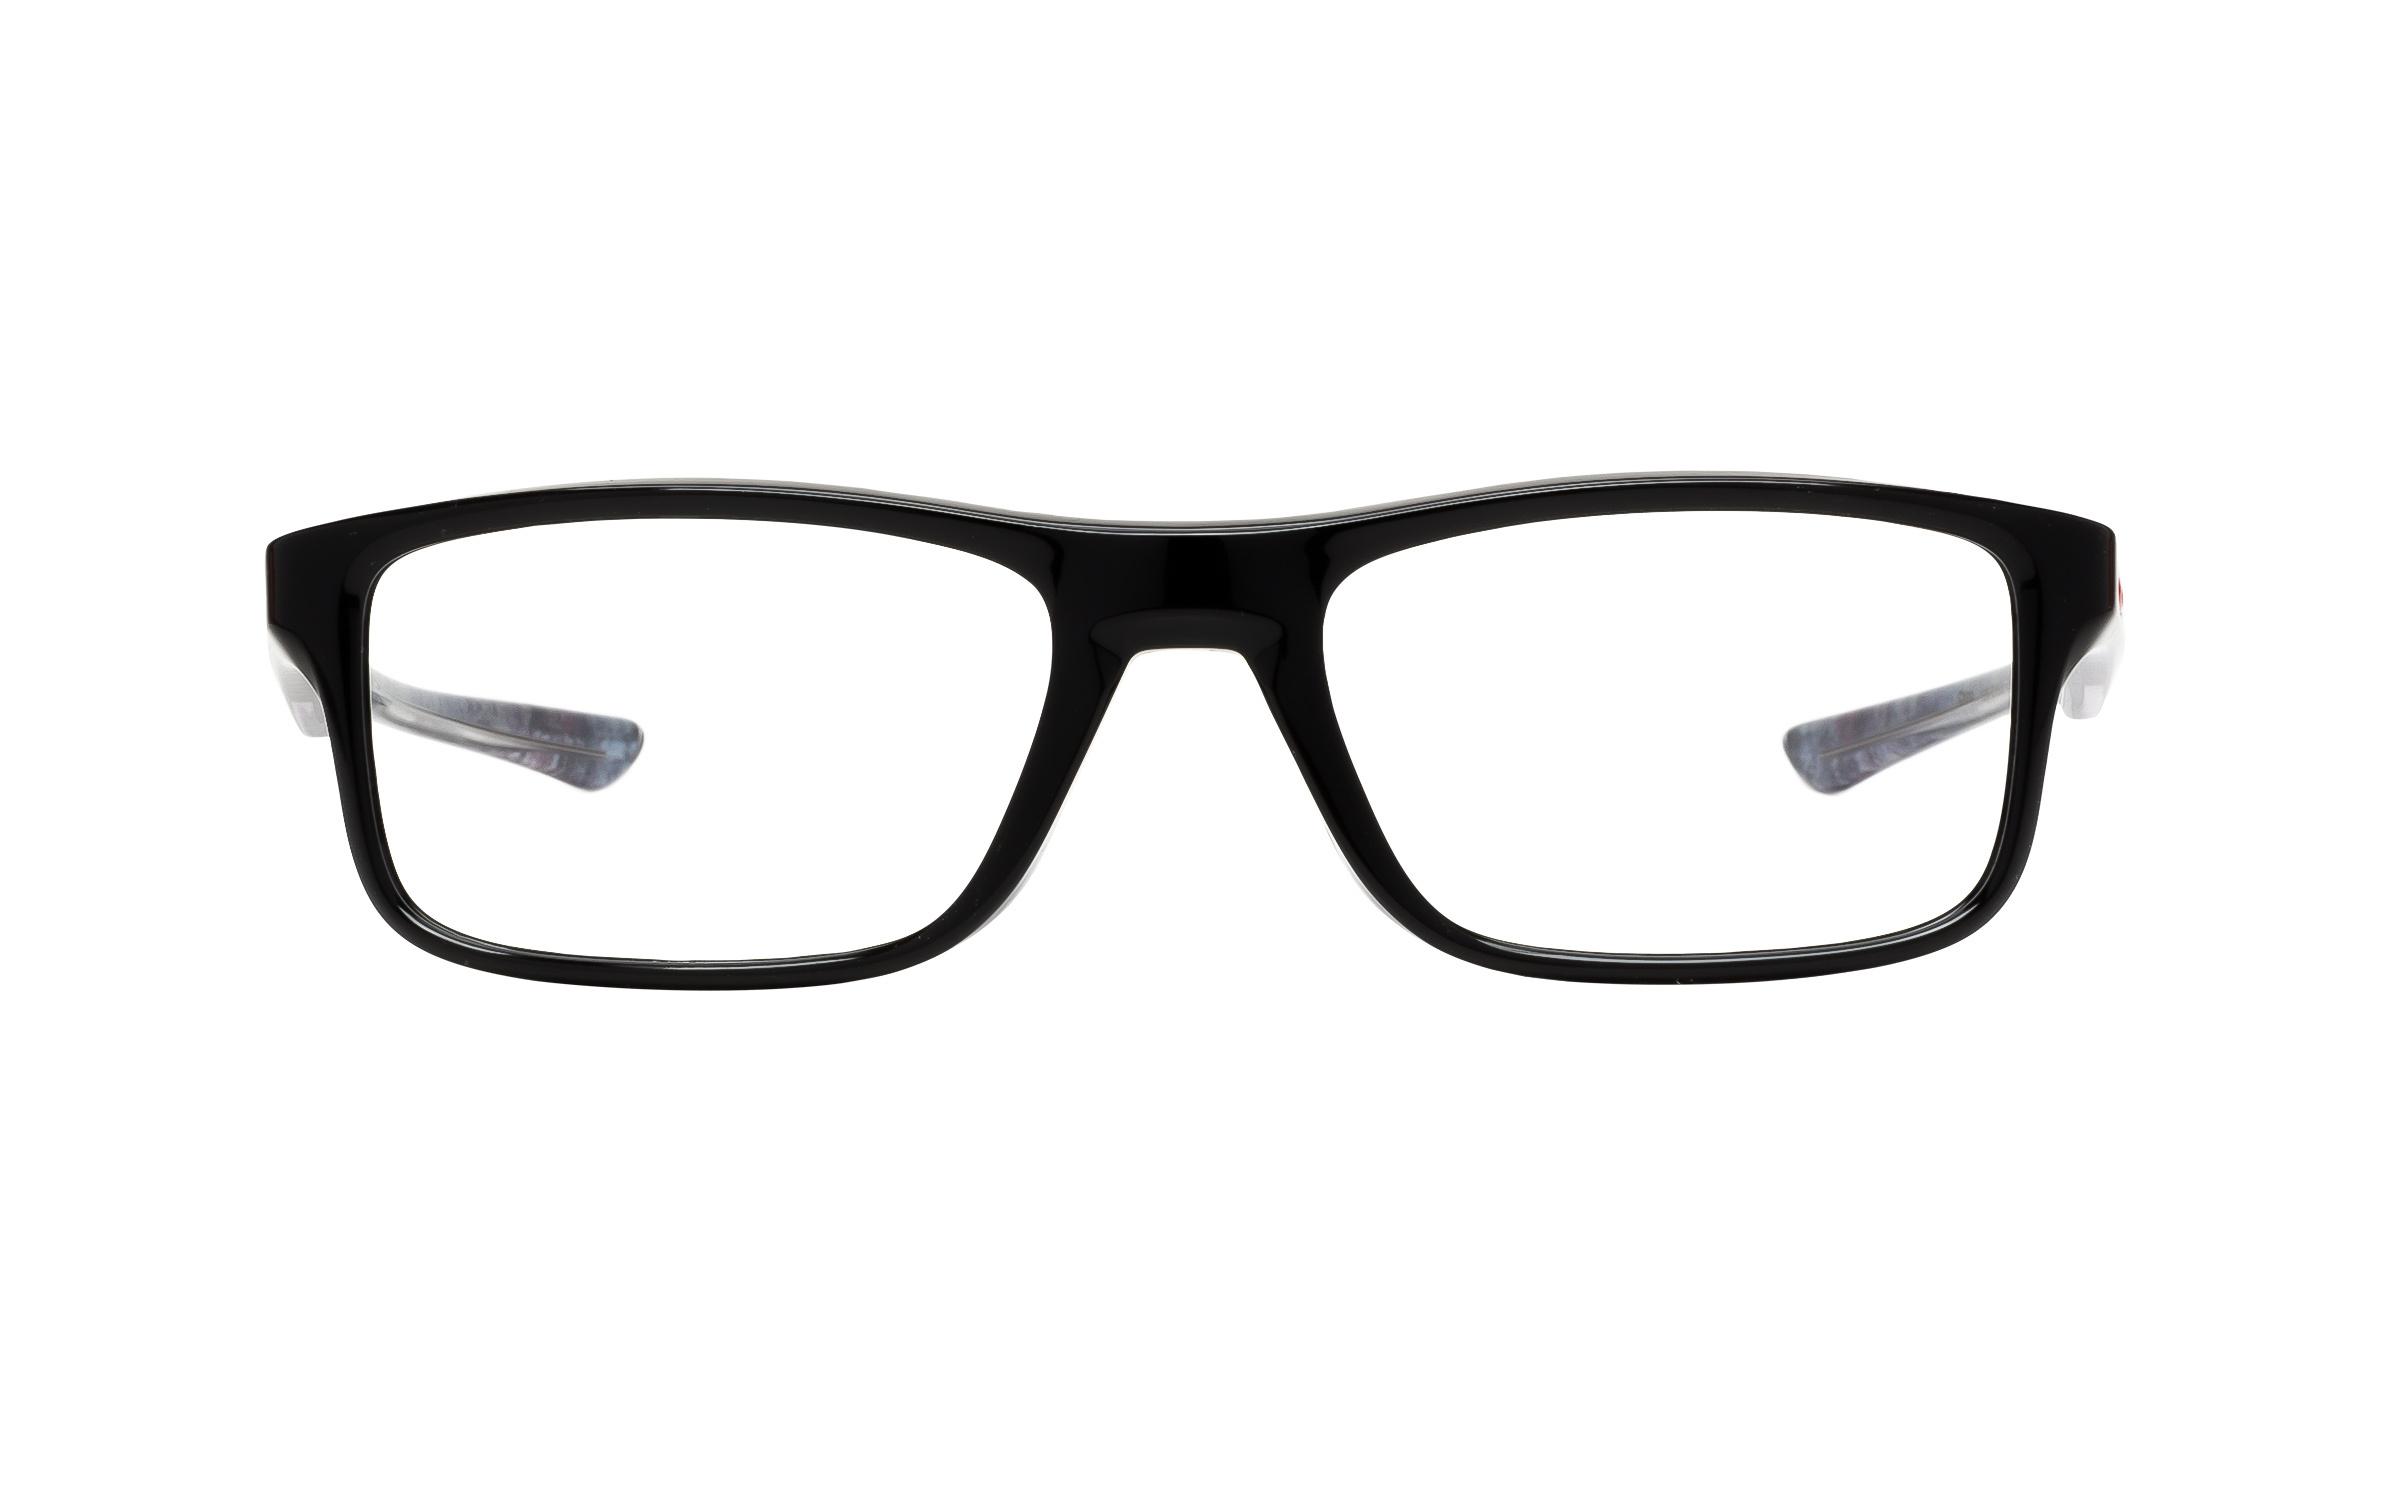 Luxottica Oakley Plank 2.0 OX8081 02 Polished Eyeglasses and Frame in Black | Acetate - Online Coastal